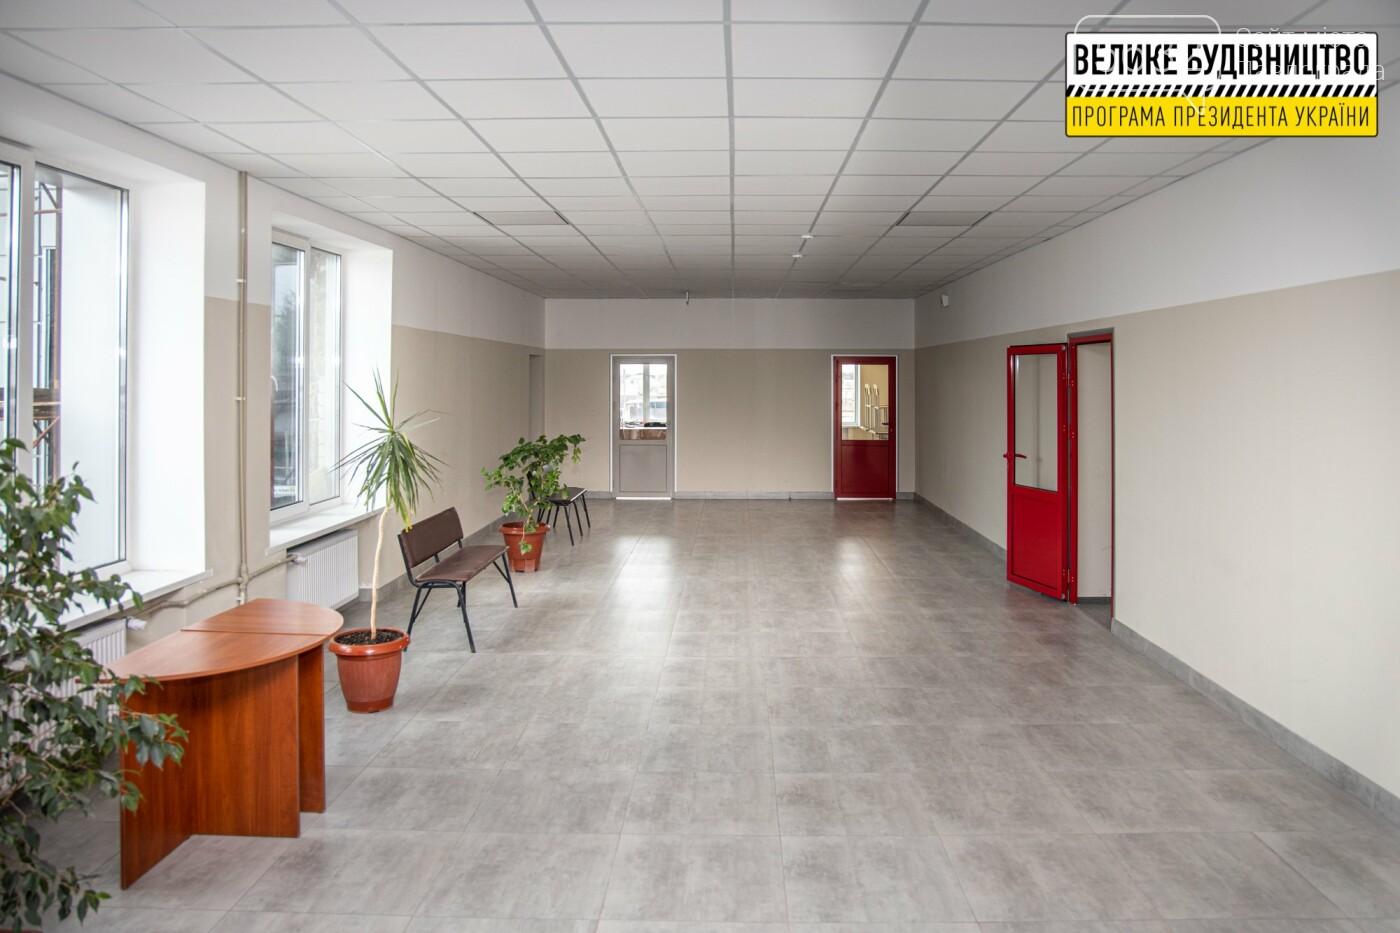 В Петропавловке модернизируют опорную школу (ФОТОРЕПОРТАЖ), фото-4